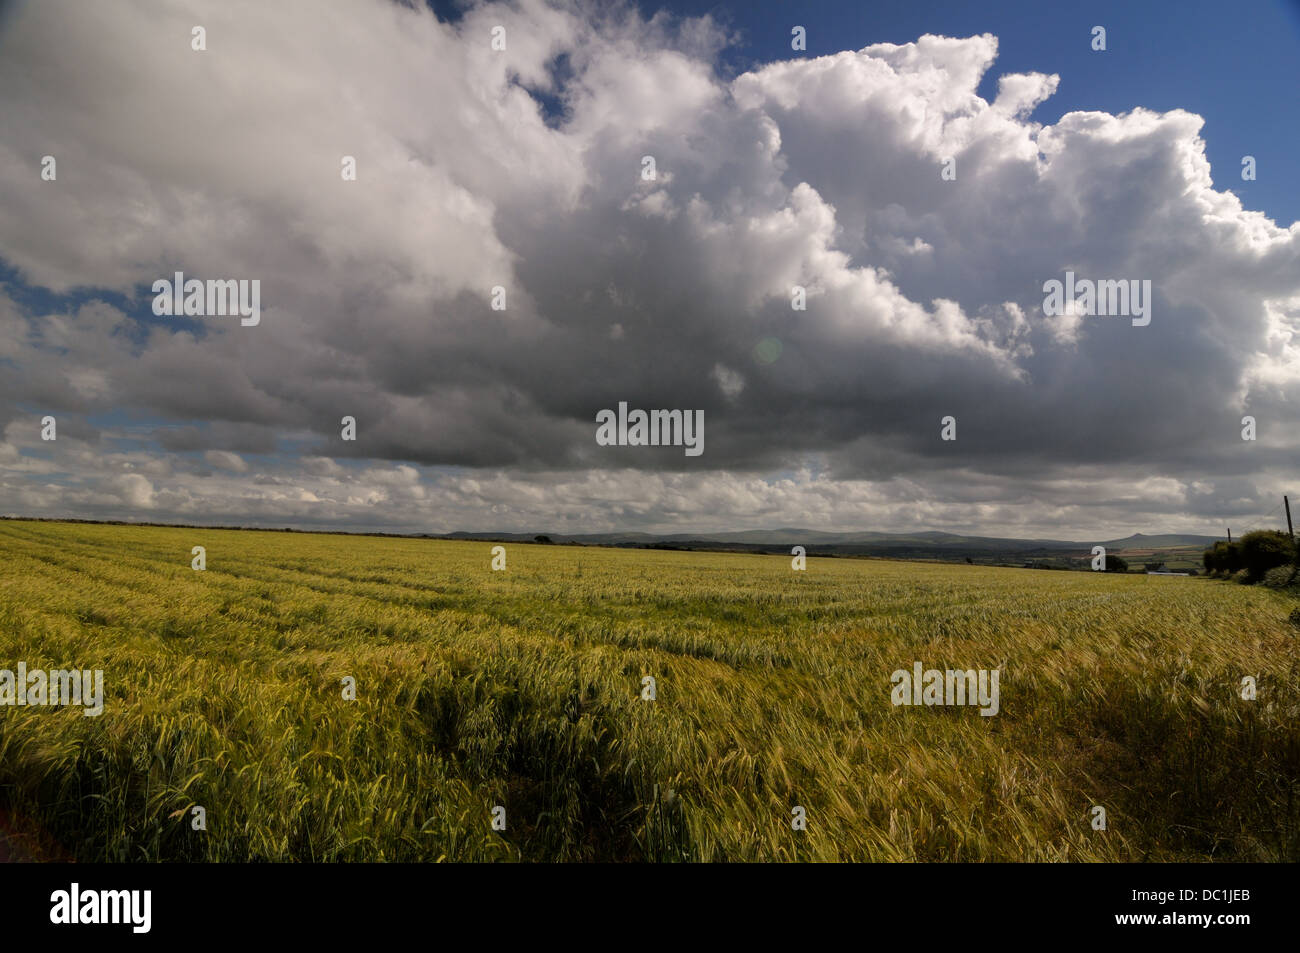 barley field thunder storm - Stock Image